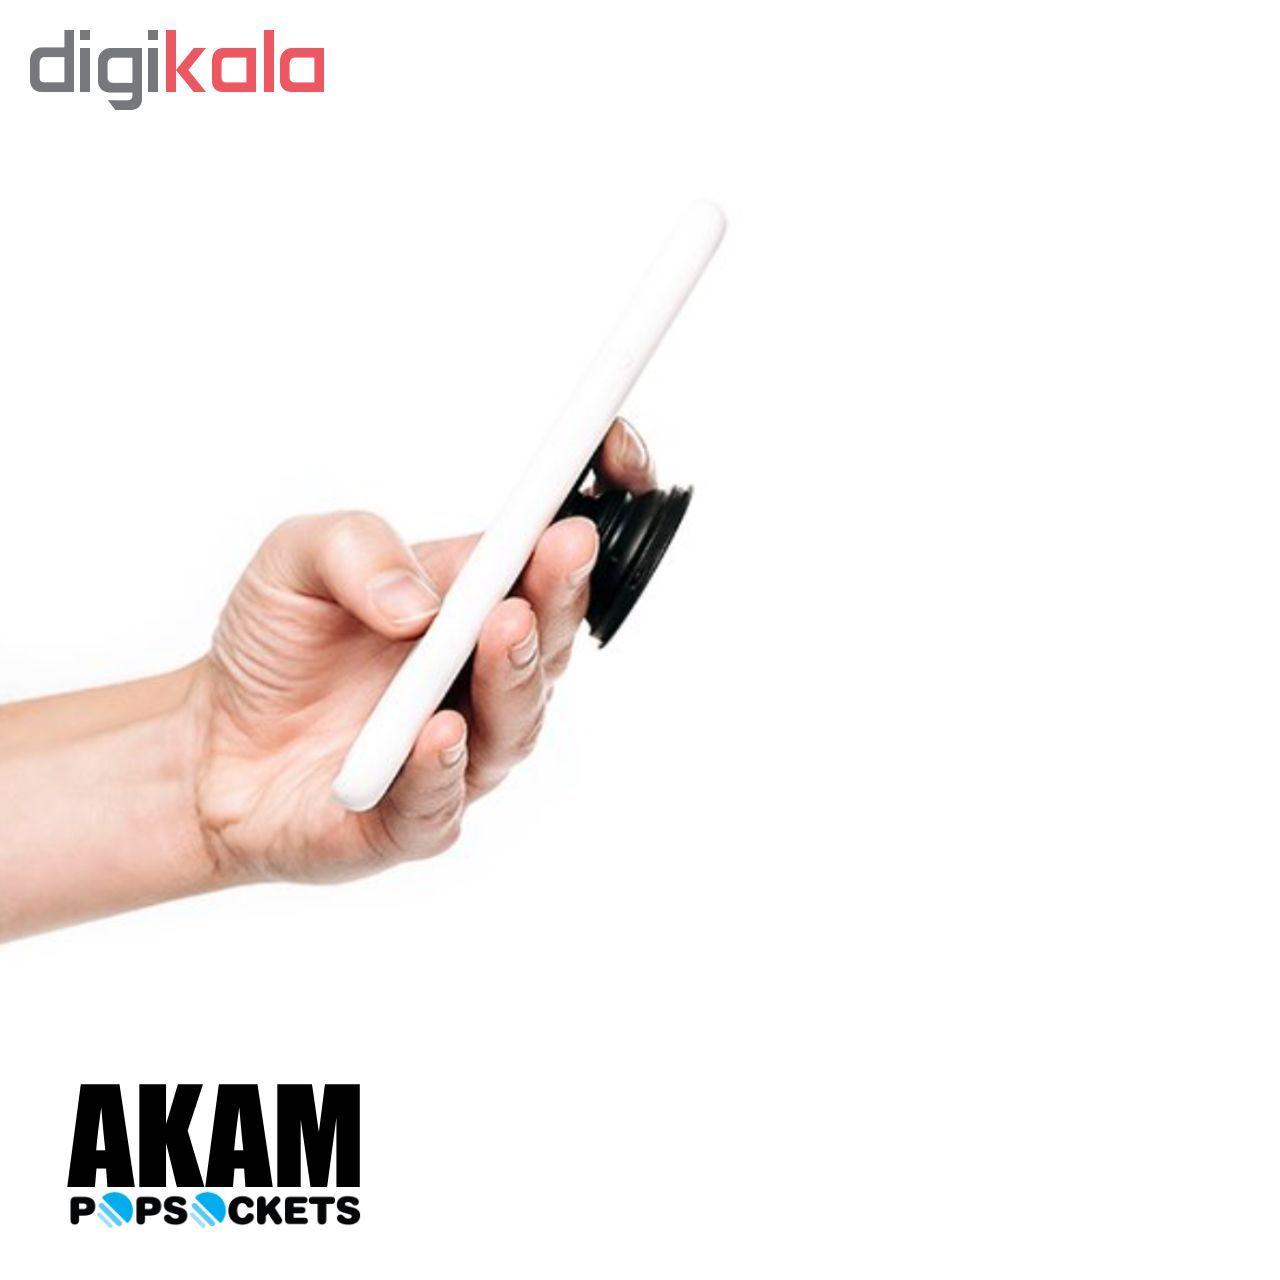 پایه نگهدارنده گوشی موبایل پاپ سوکت آکام مدل APS0163 main 1 8